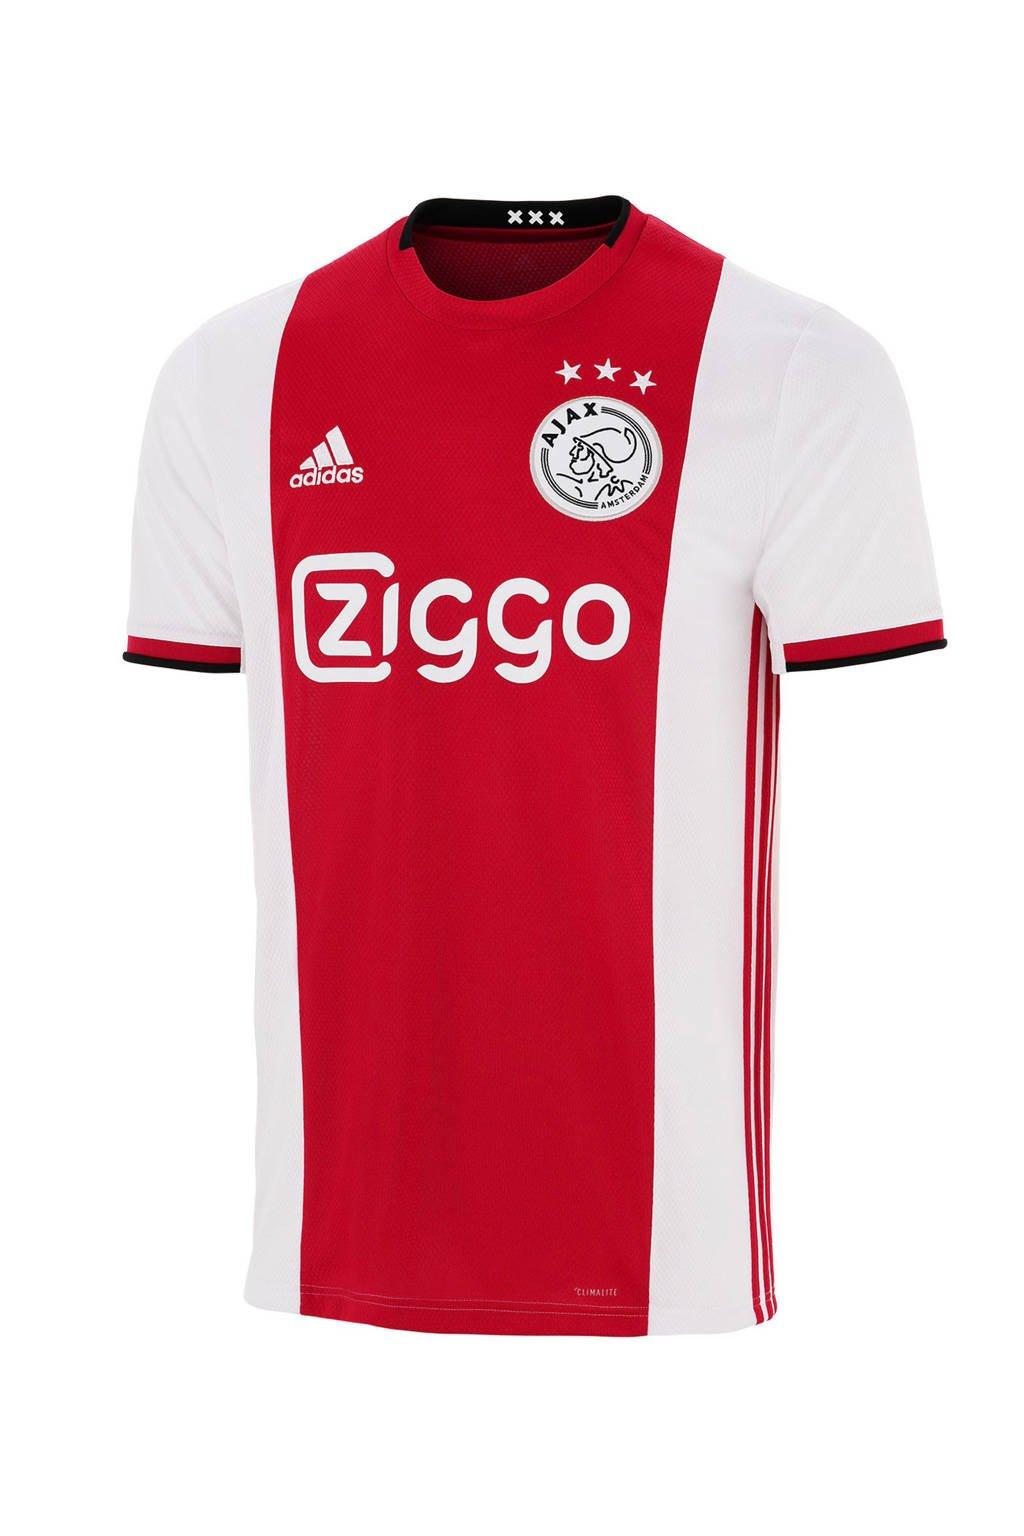 adidas performance Senior Ajax voetbalshirt, Heren, Rood/wit/zwart